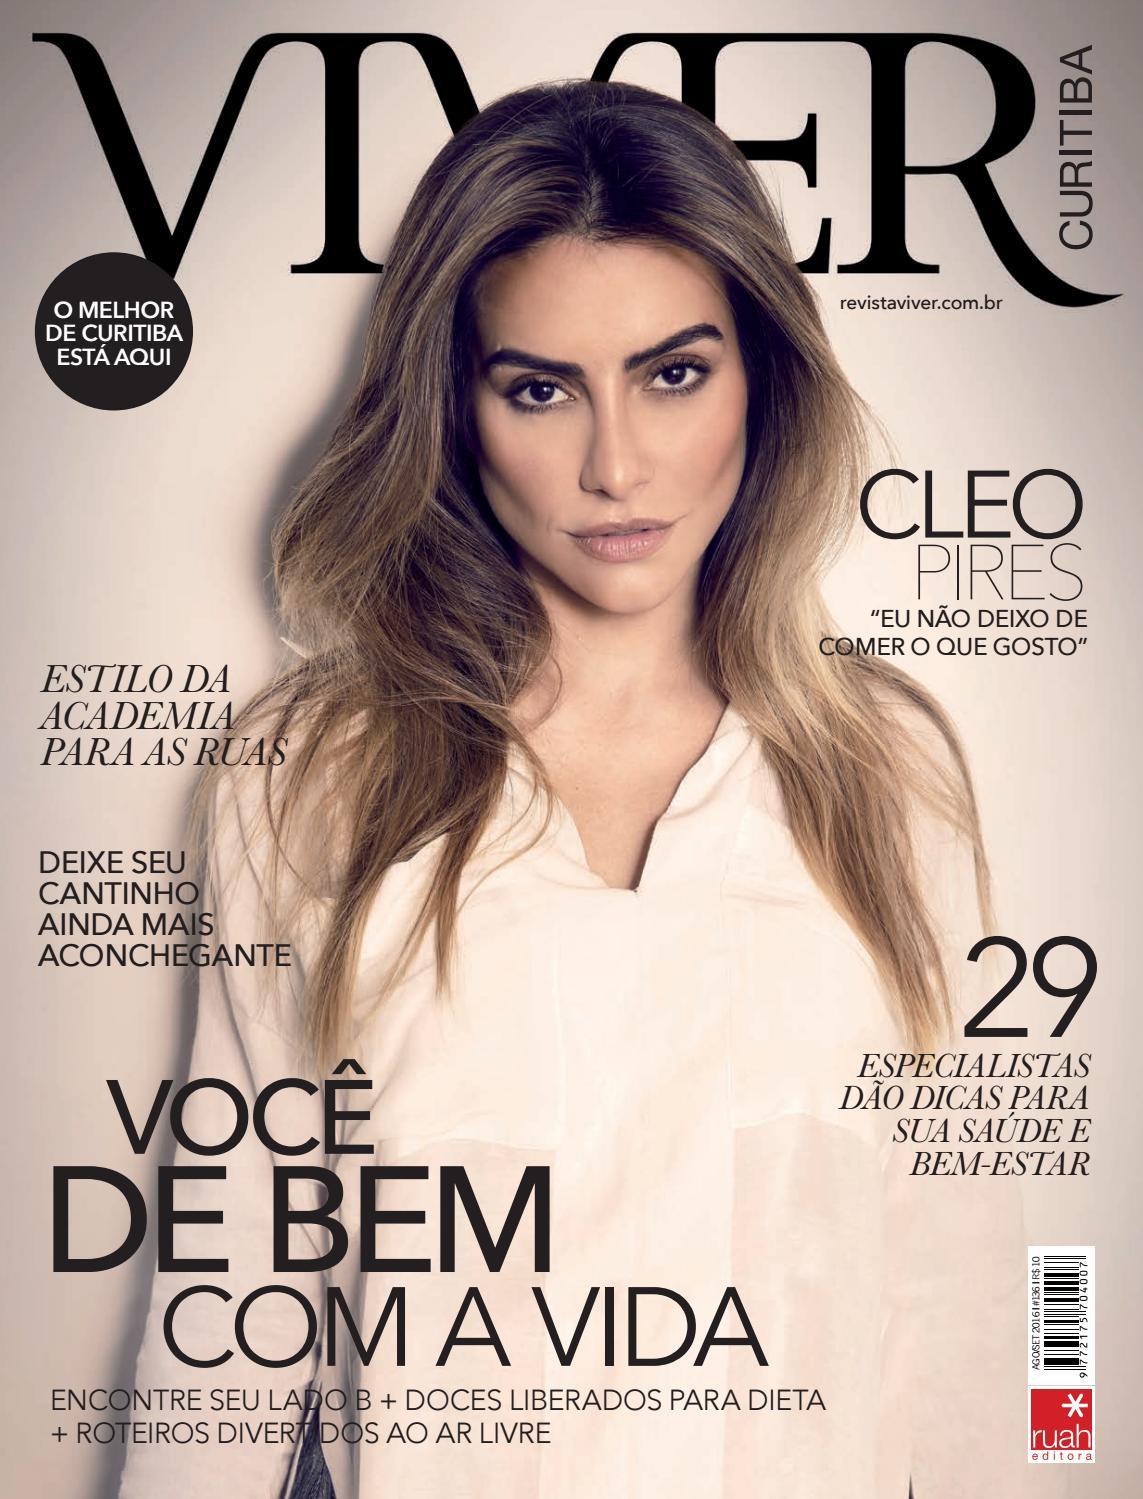 VIVER CURITIBA 136 by Viver Curitiba - issuu 40289ff7b83